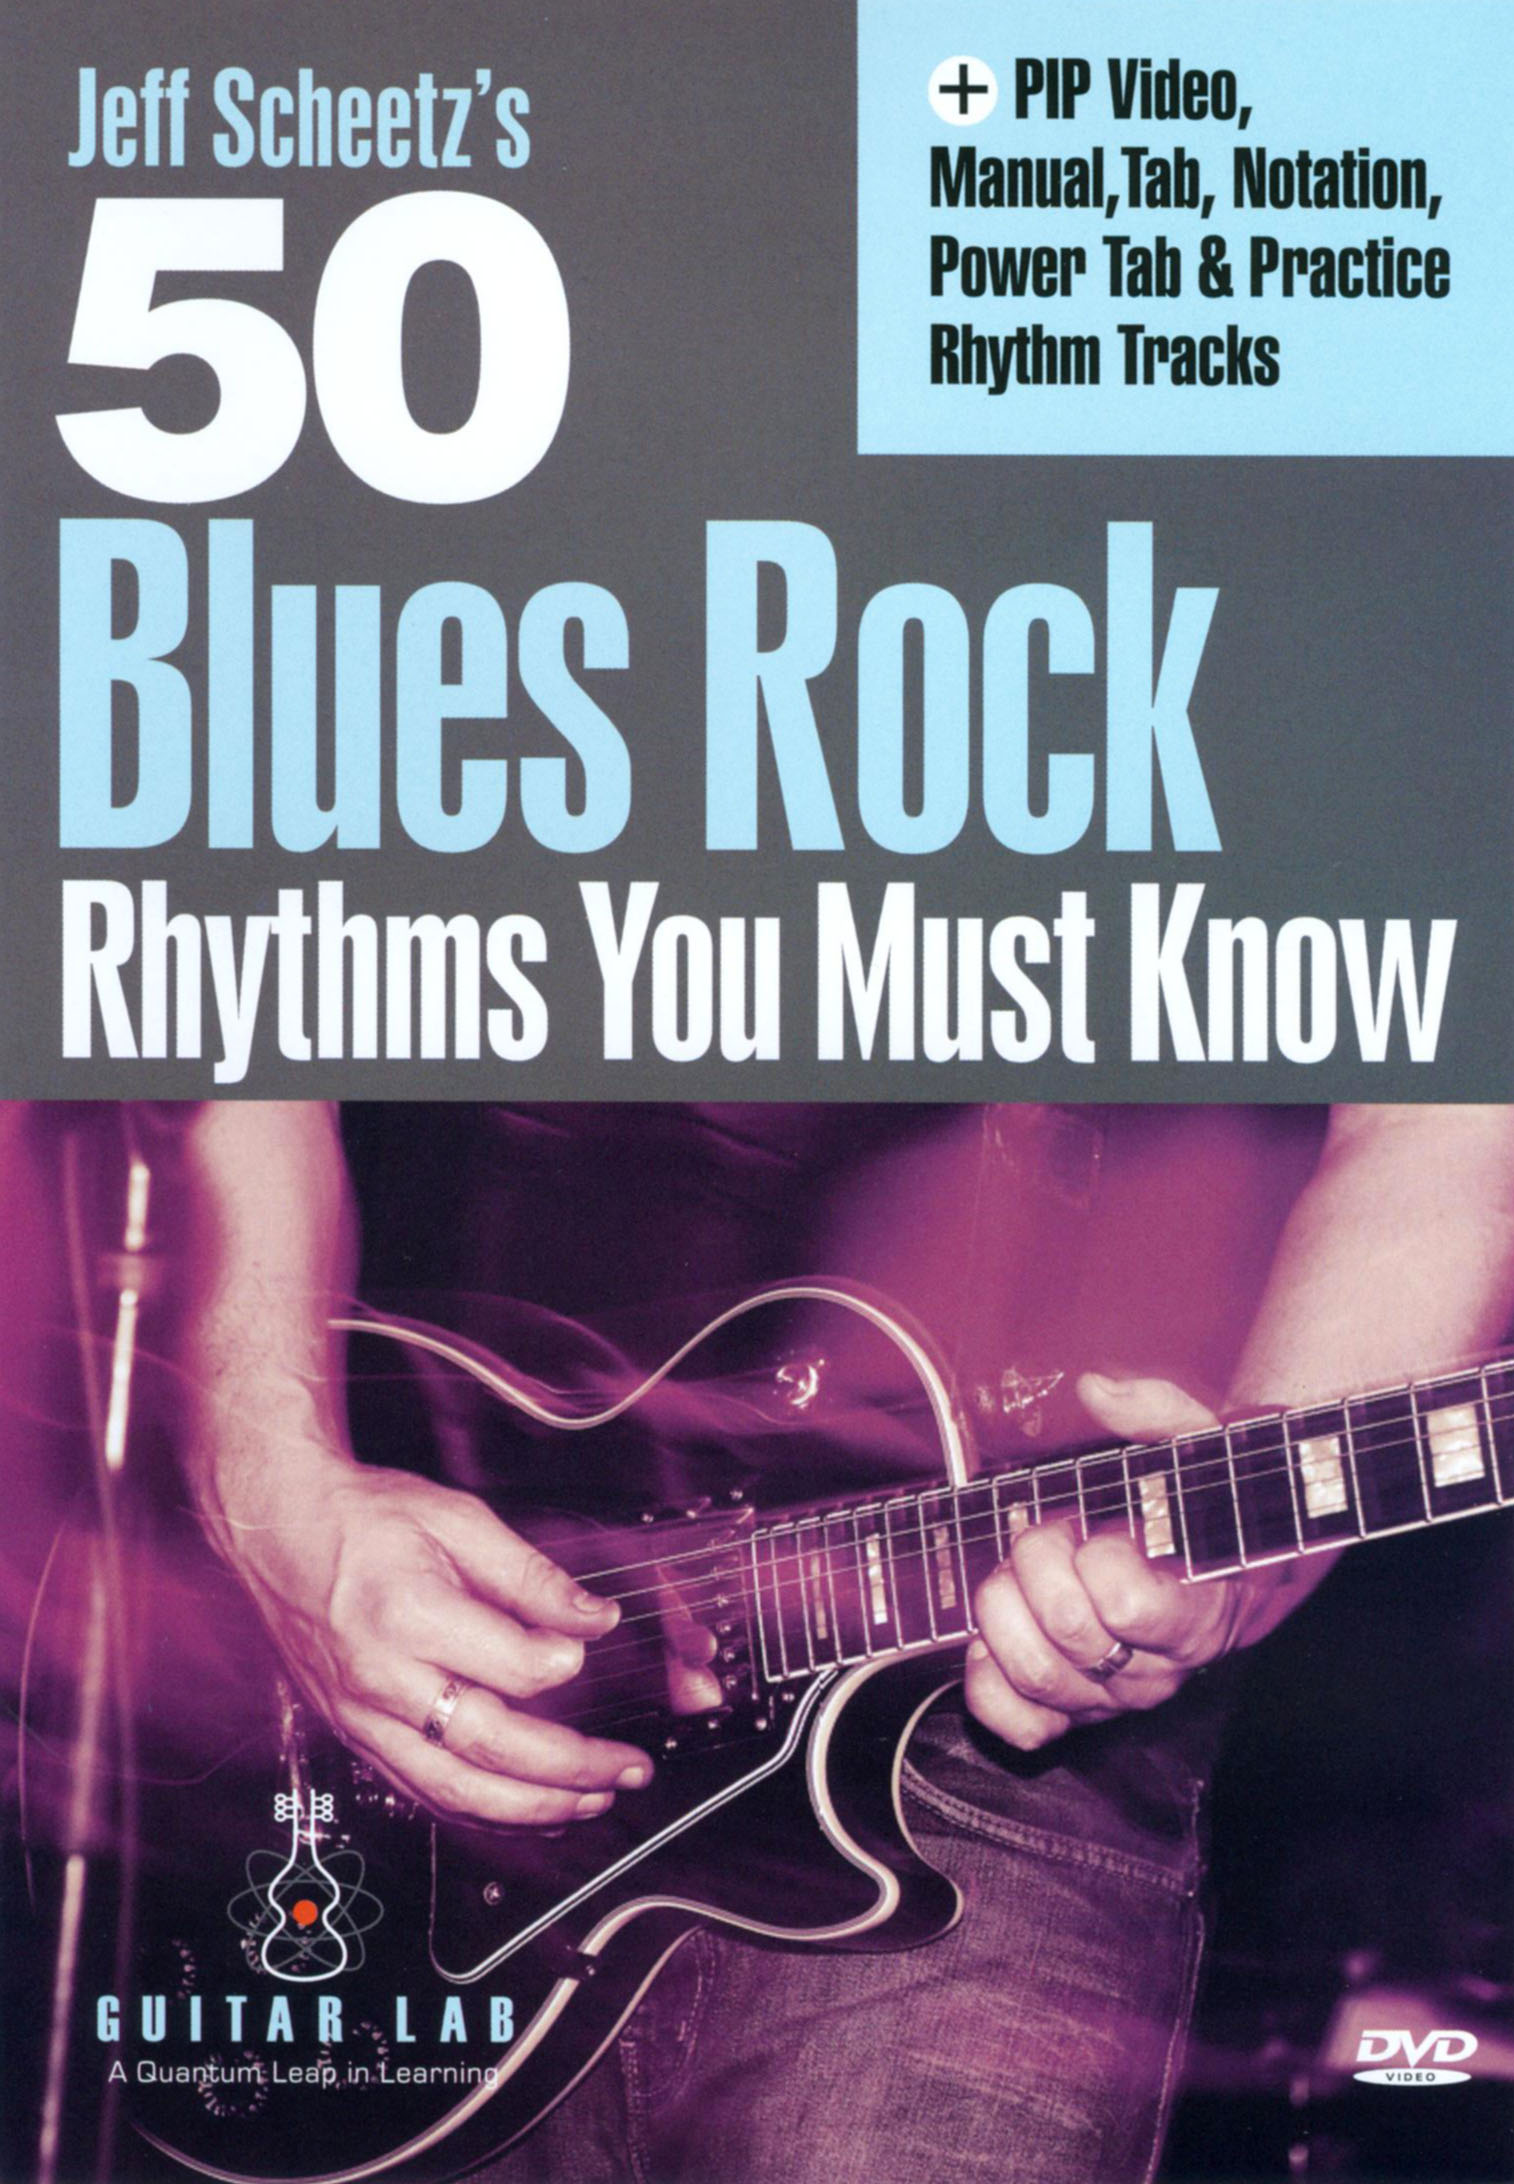 Jeff Scheetz's 50 Blues Rock Rhythms You Must Know